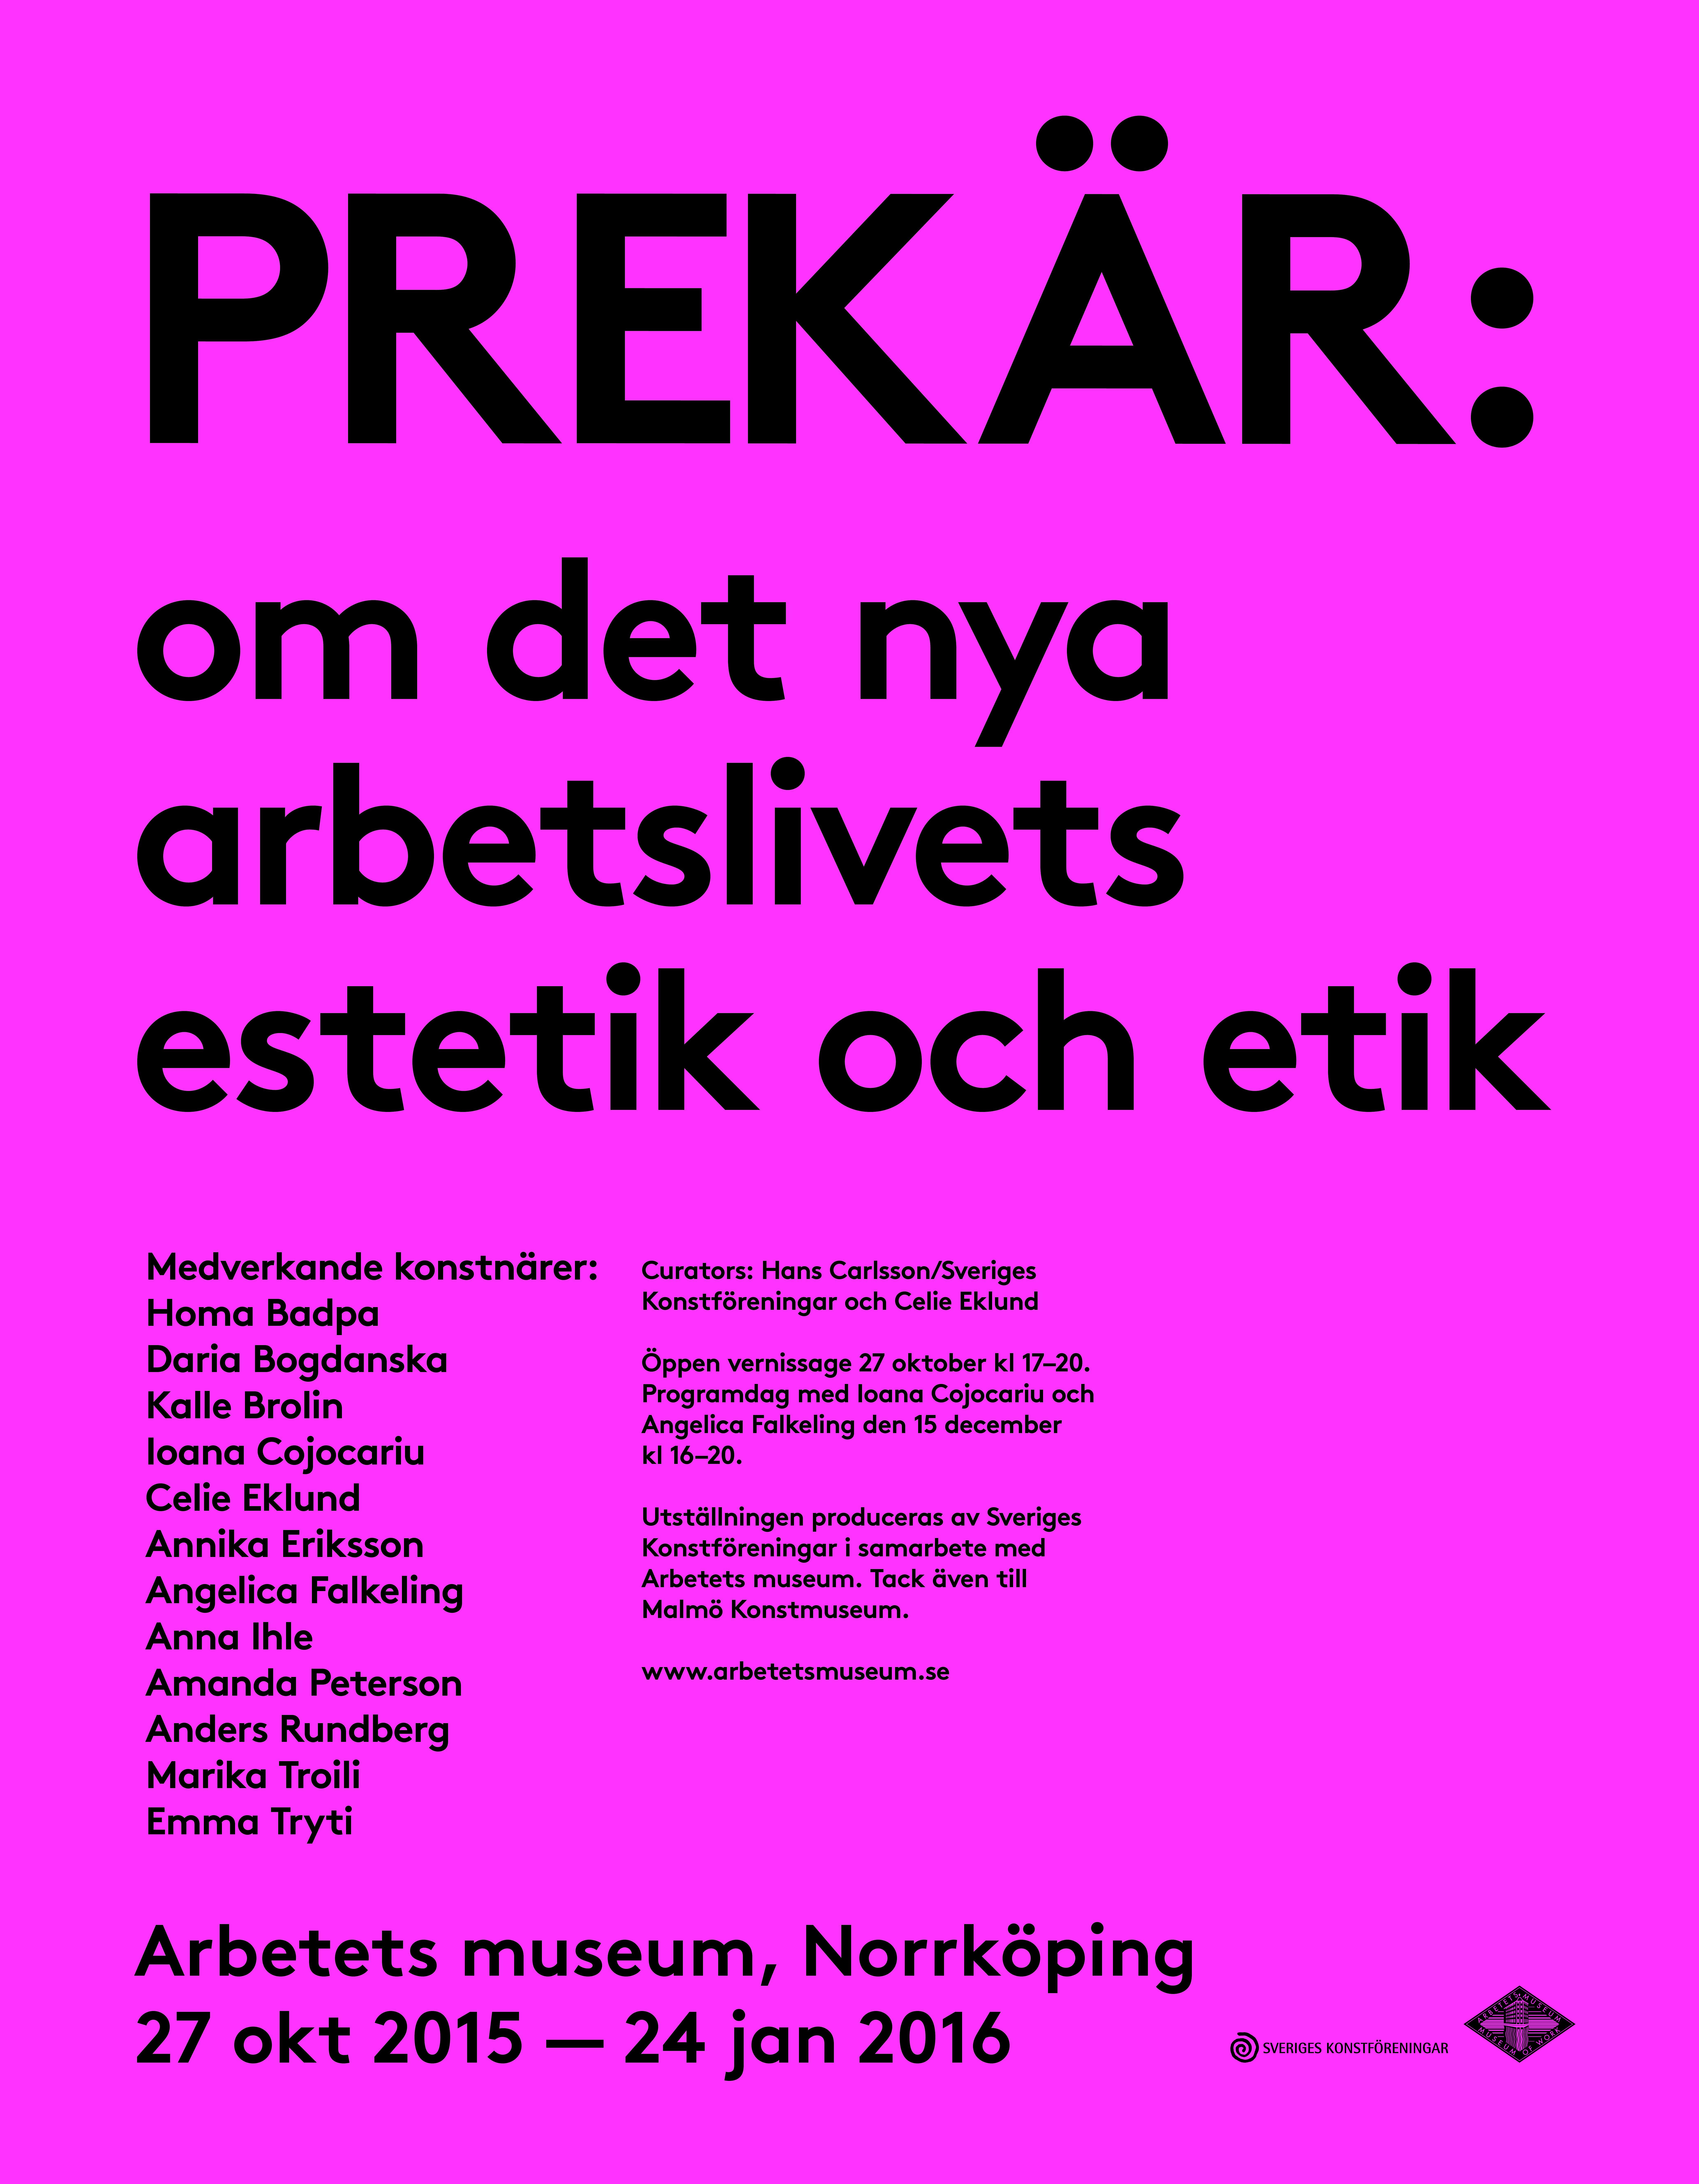 Prekär affisch_digital(2)